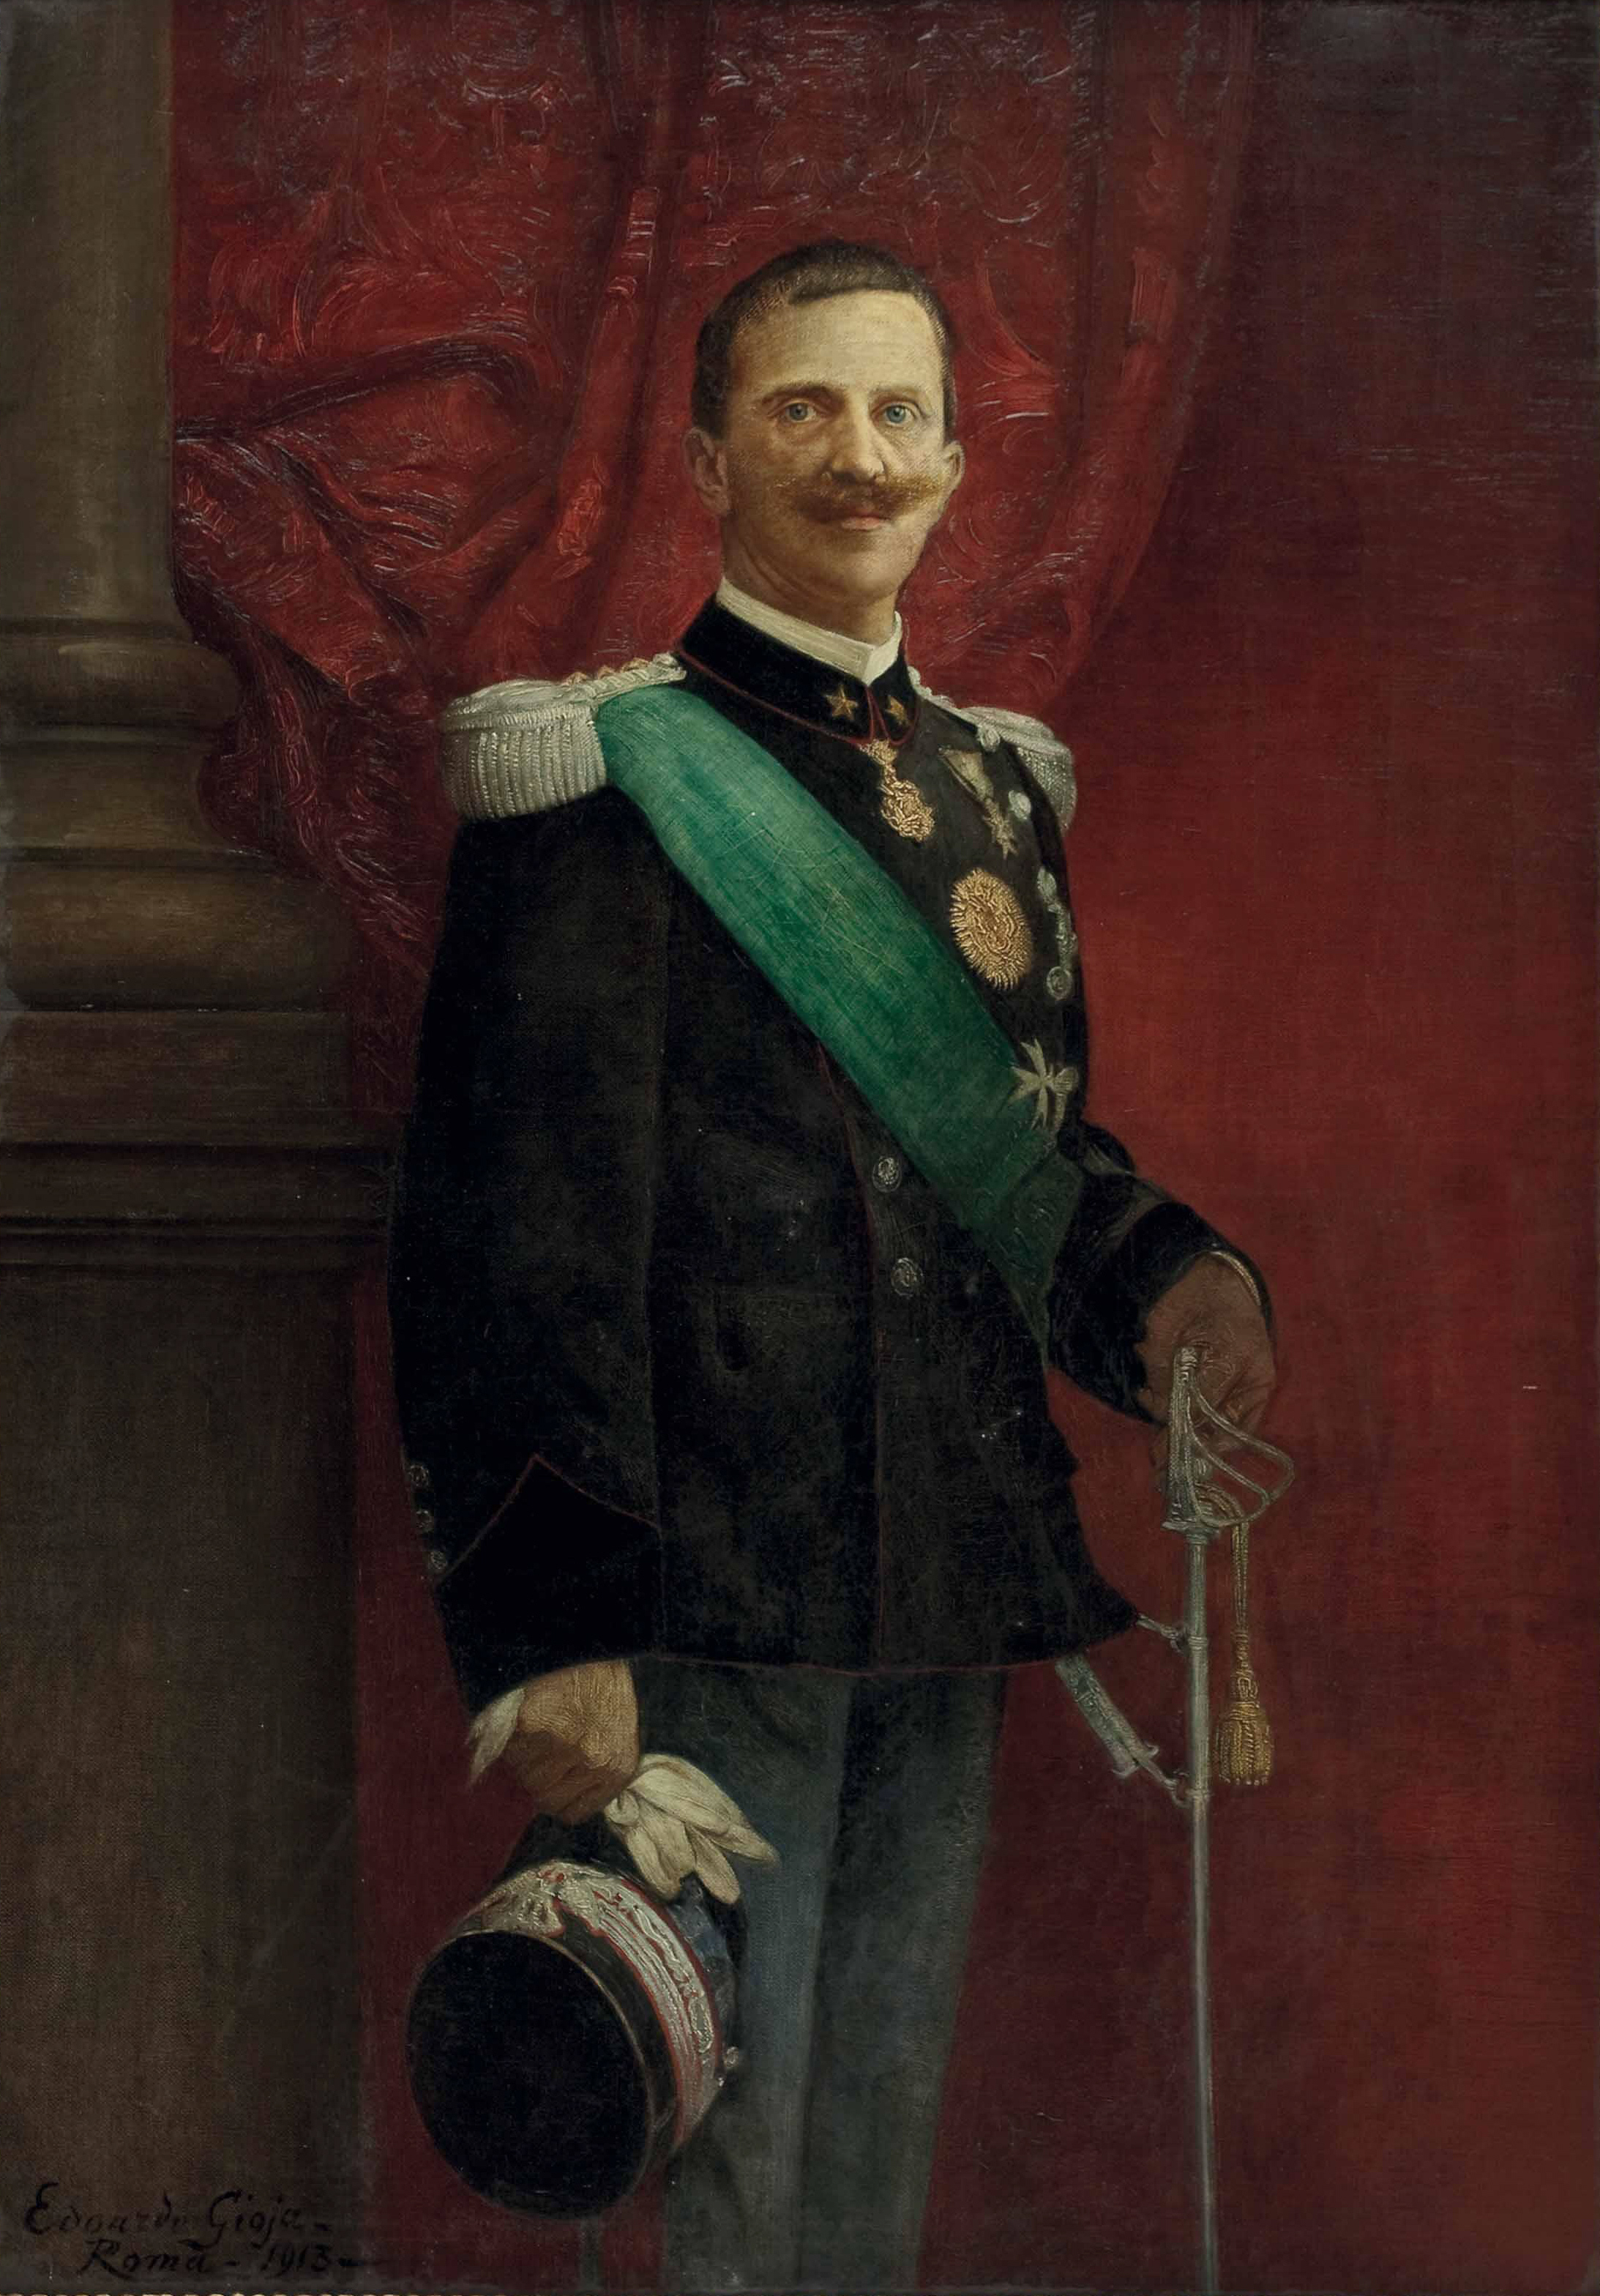 Eduardo_Gioja_Viktor_Emanuel_III_1913.jpg